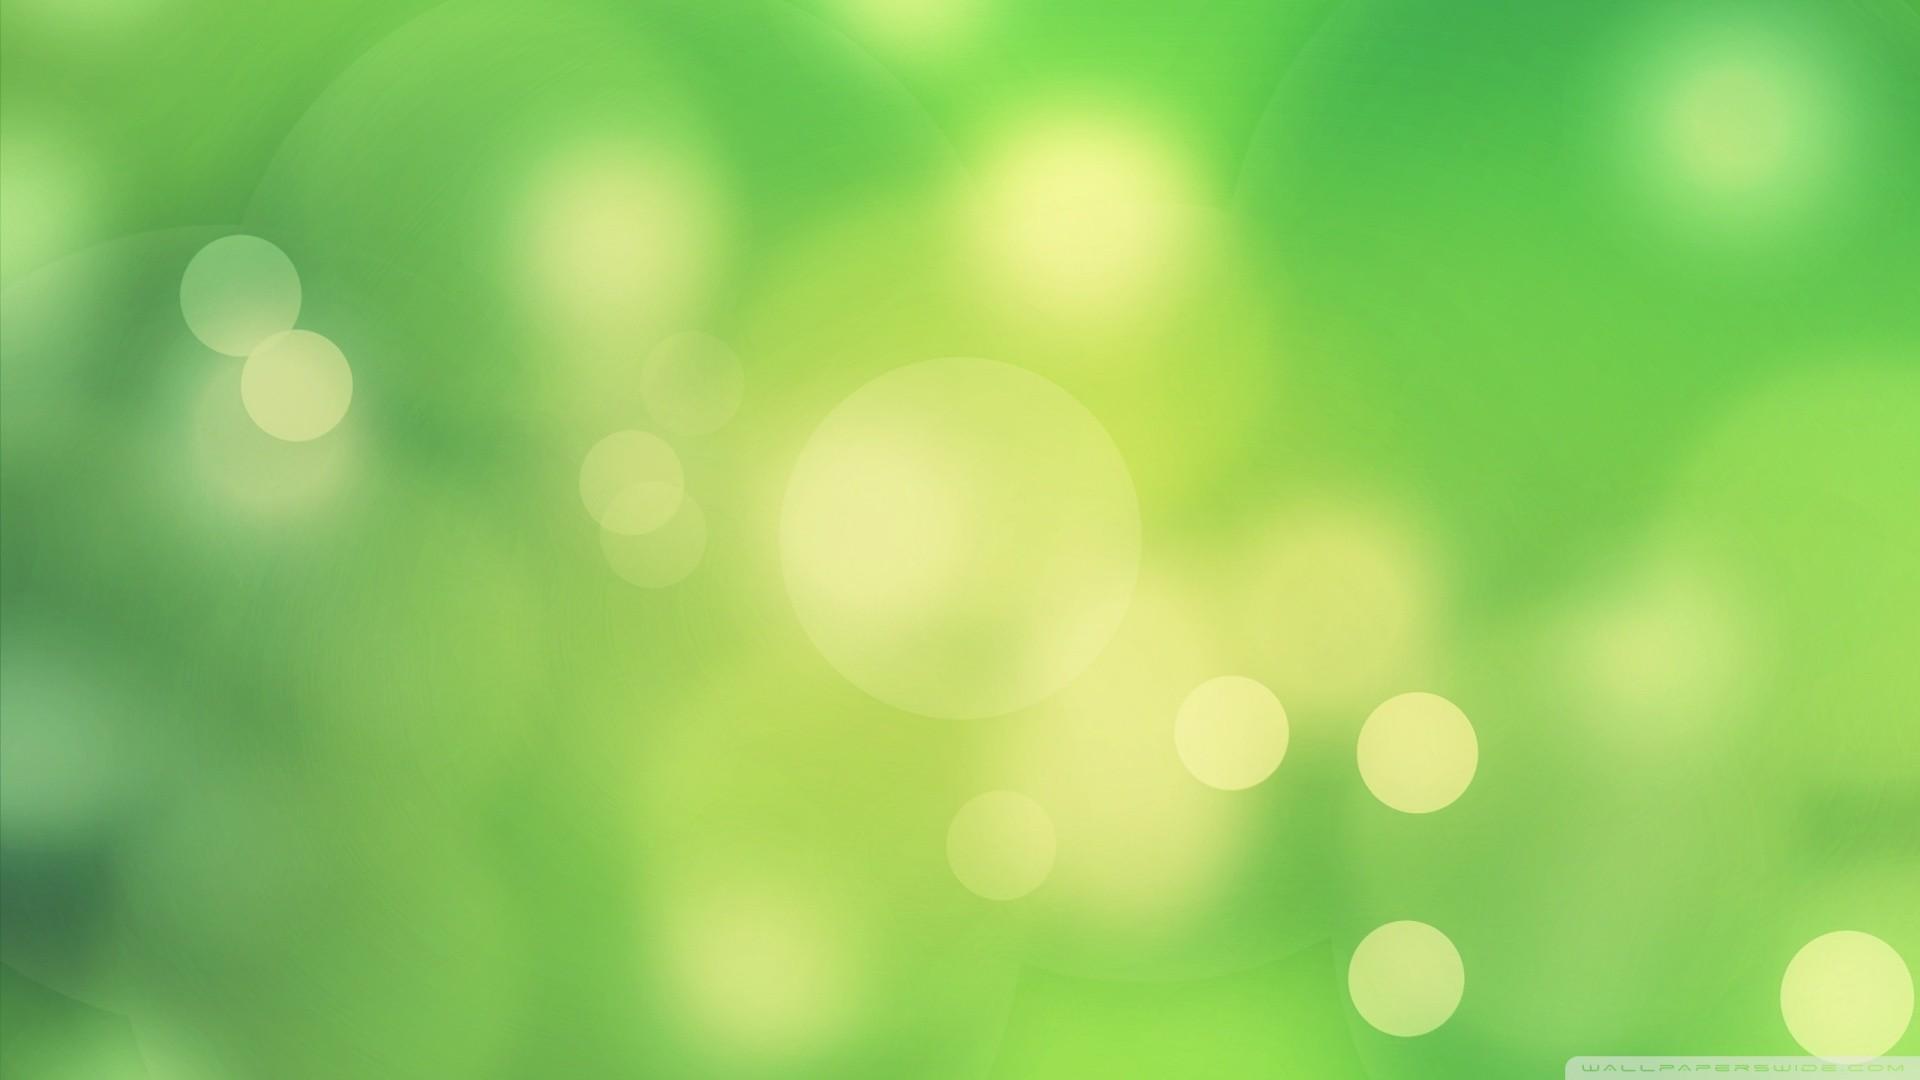 Green Background 2 Wallpaper Green, Background, 2